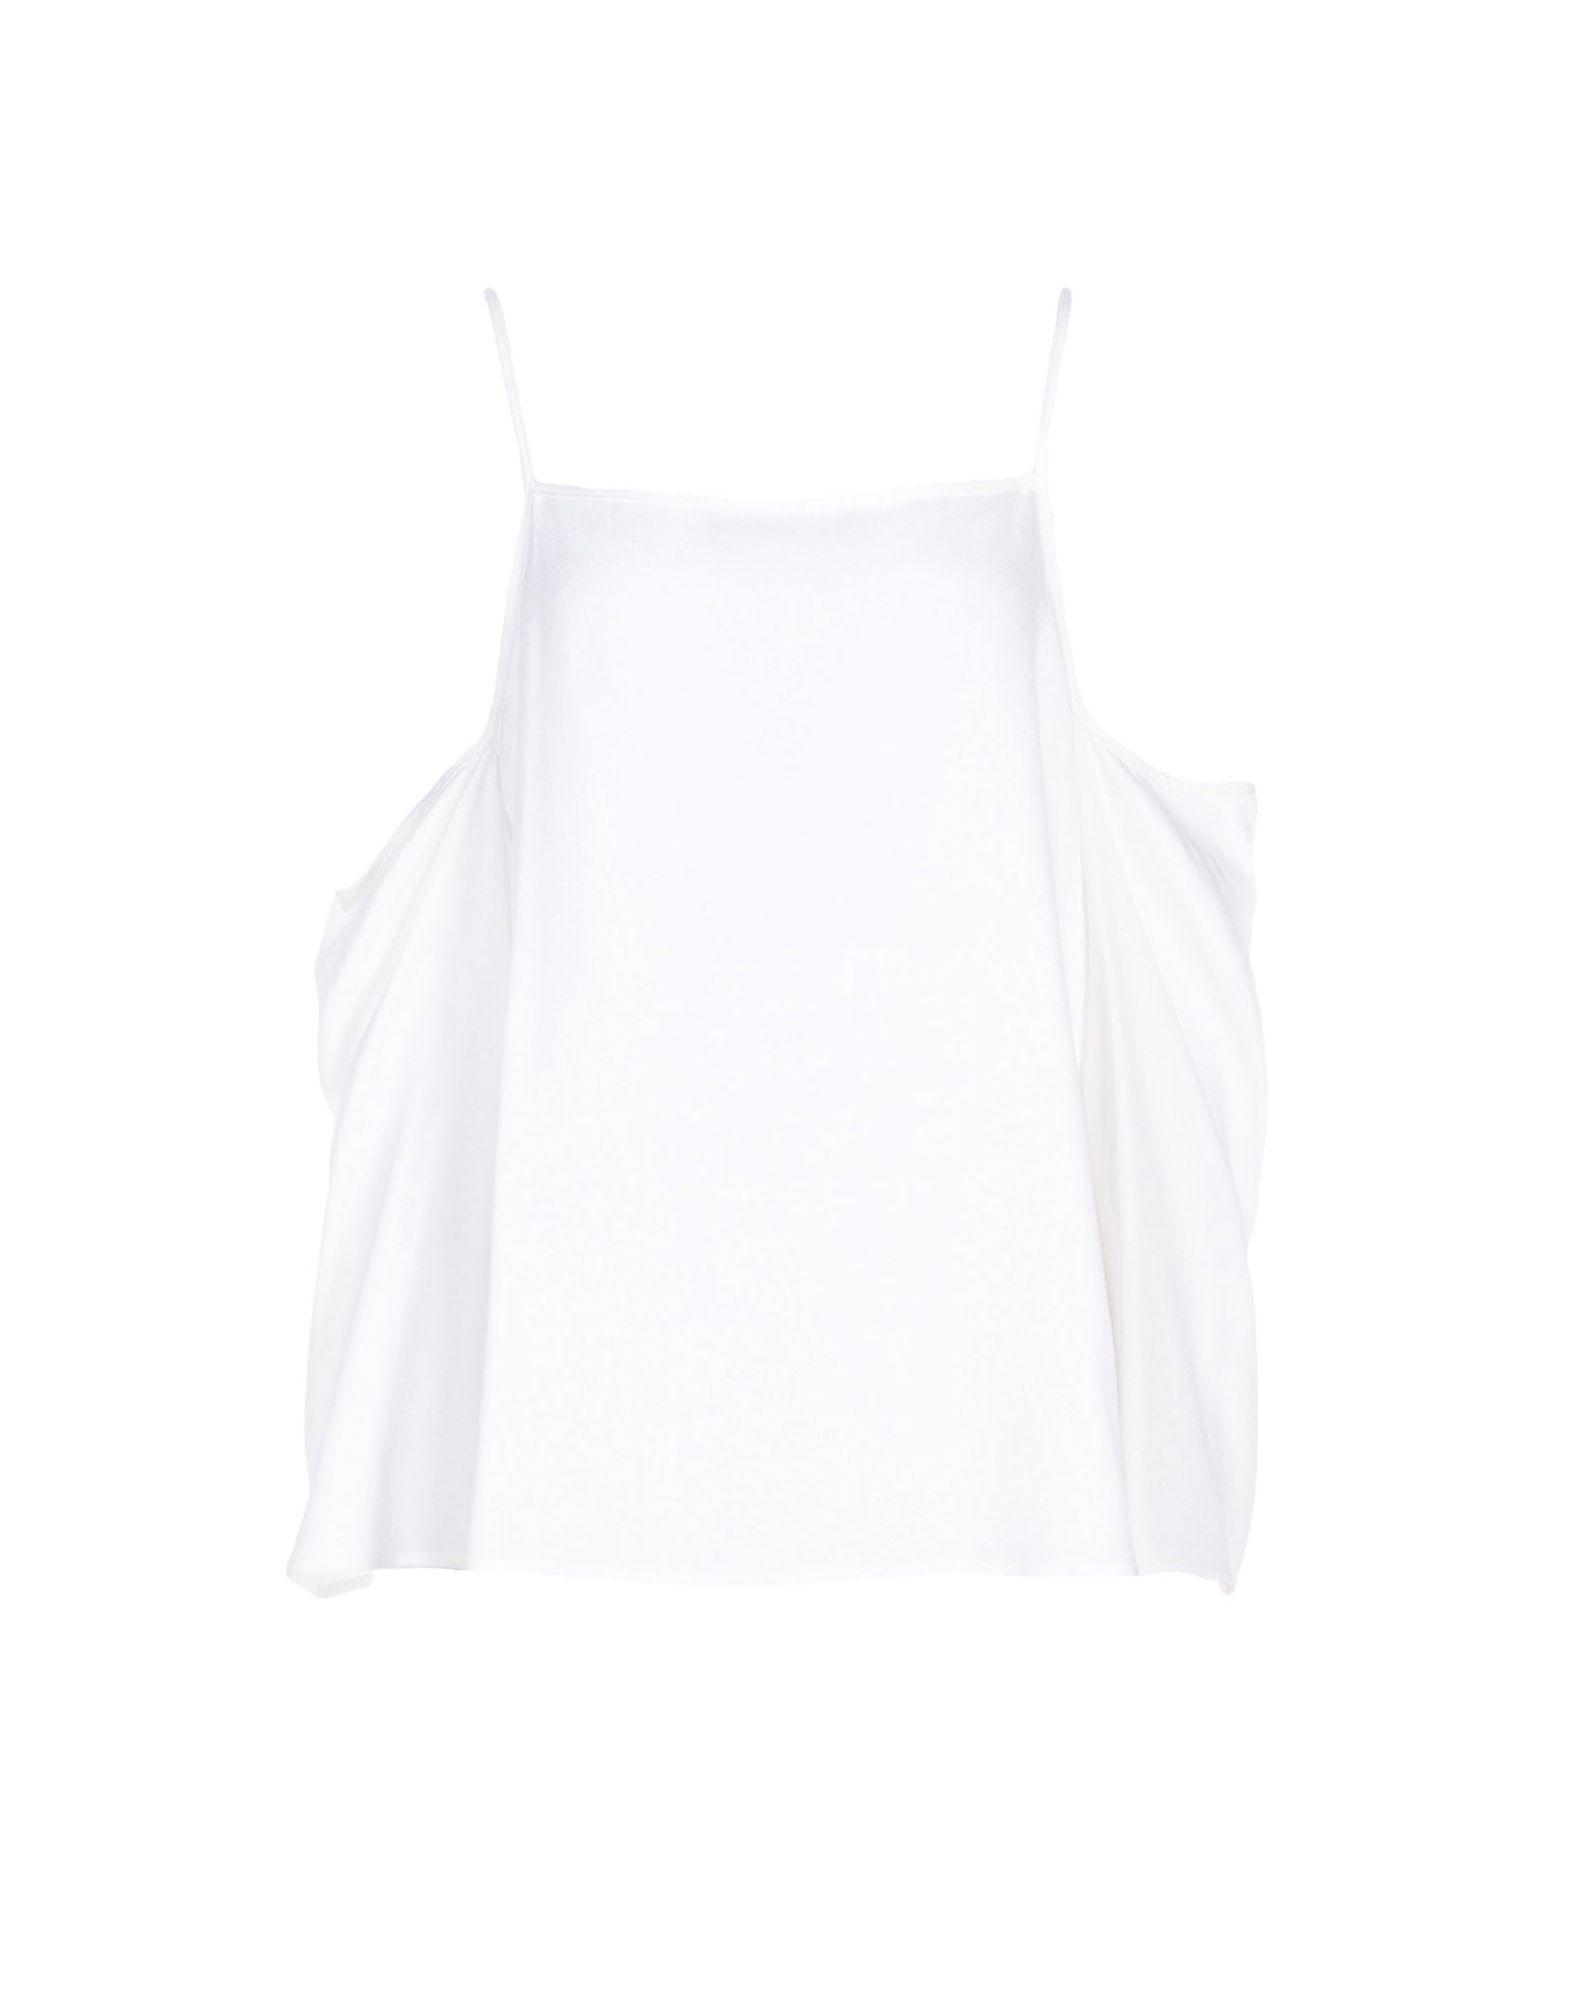 COLLECTION PRIVĒE? Блузка блузка женская oodji collection цвет черный красный 24201012 26256 2945f размер l 48